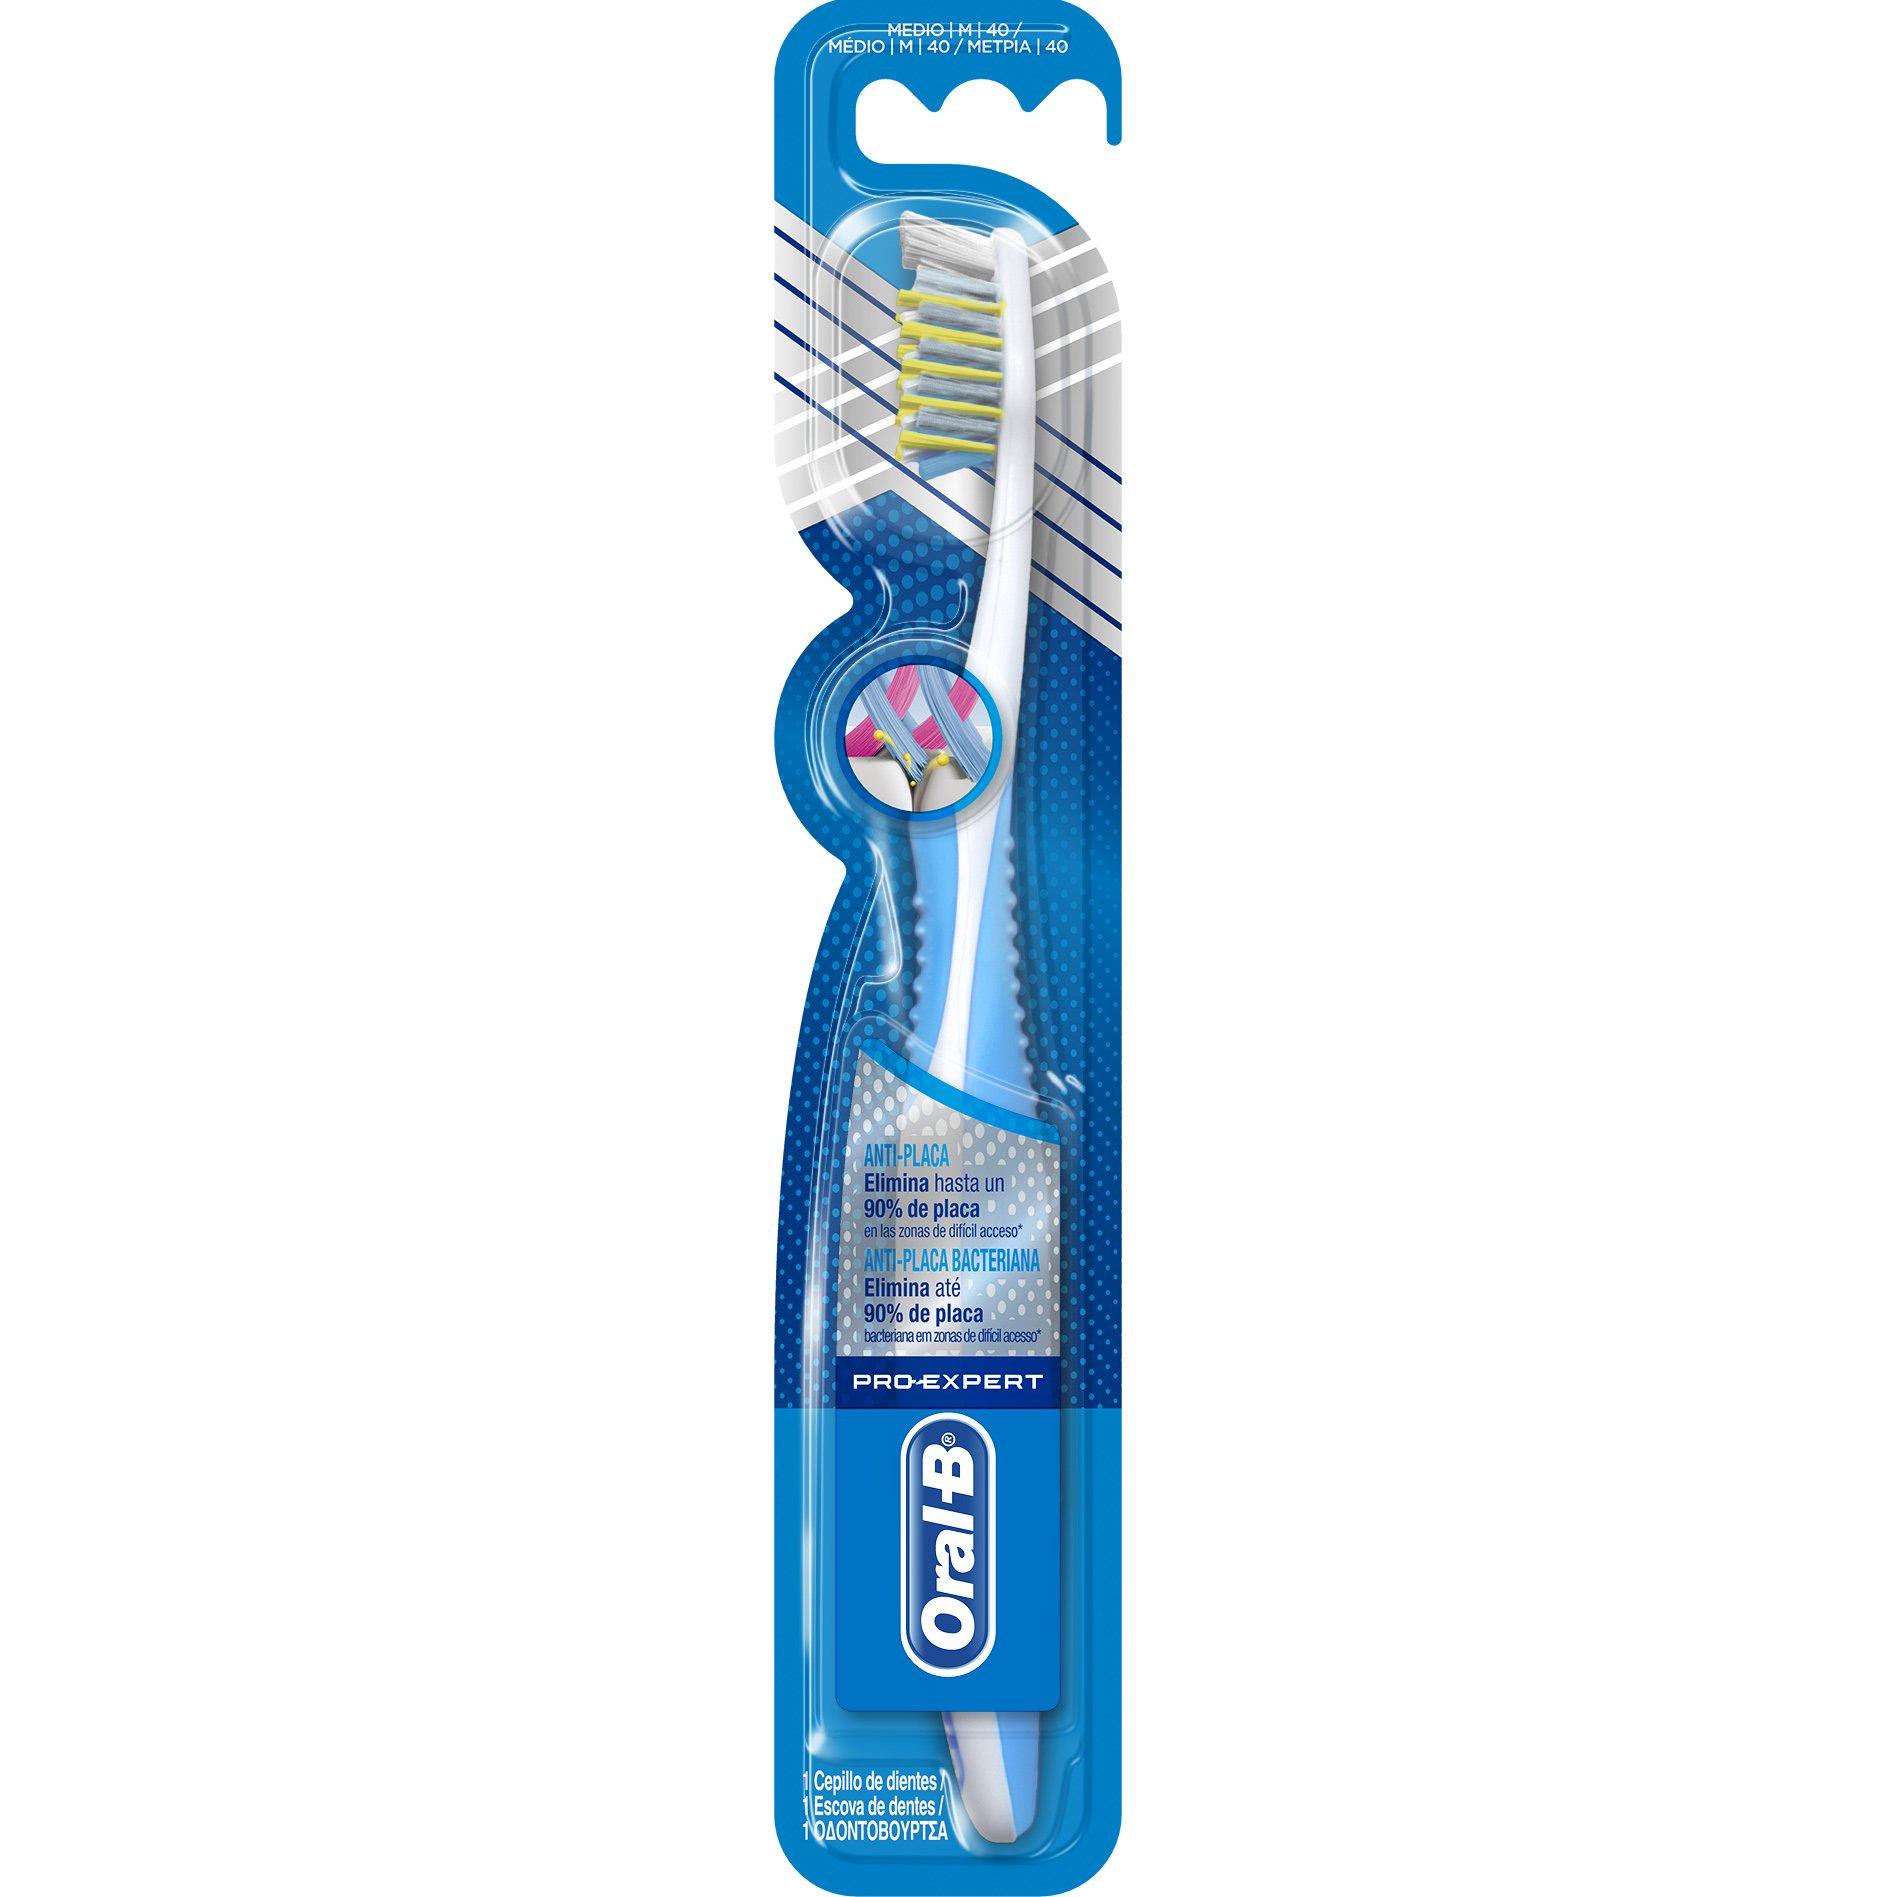 Oral-B Pro-Expert Cross Action Anti-Plac 40 Medium Οδοντόβουρτσα Κατά της Μικροβιακής Πλάκας με Εύκαμπτες Ίνες 1τεμάχιο